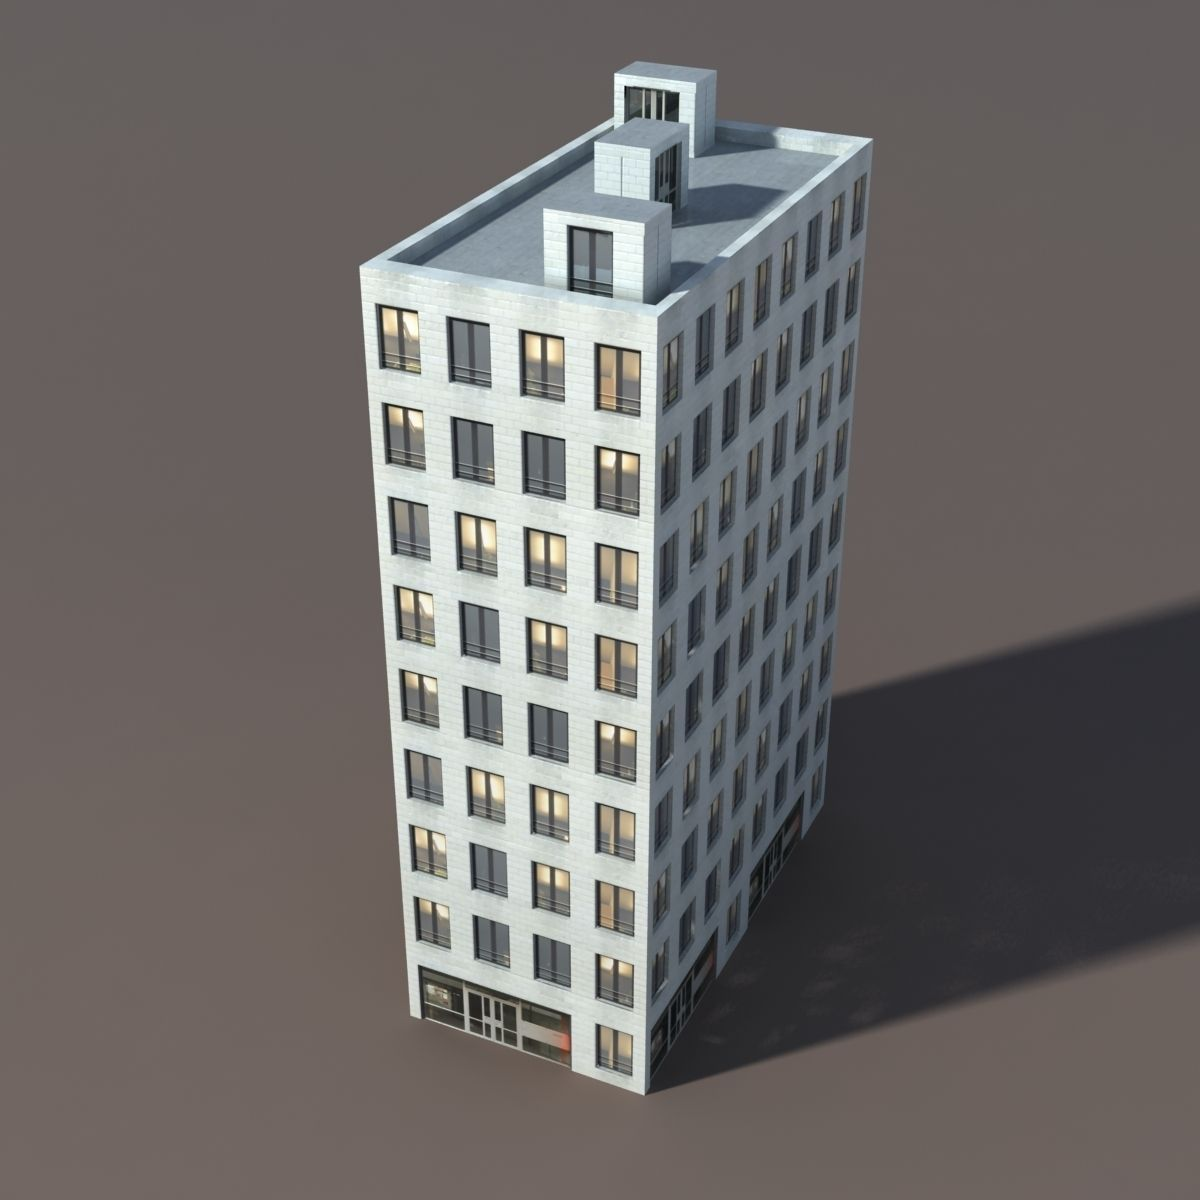 3d model residential house 3 low poly 3d model vr ar for 3d house builder online free